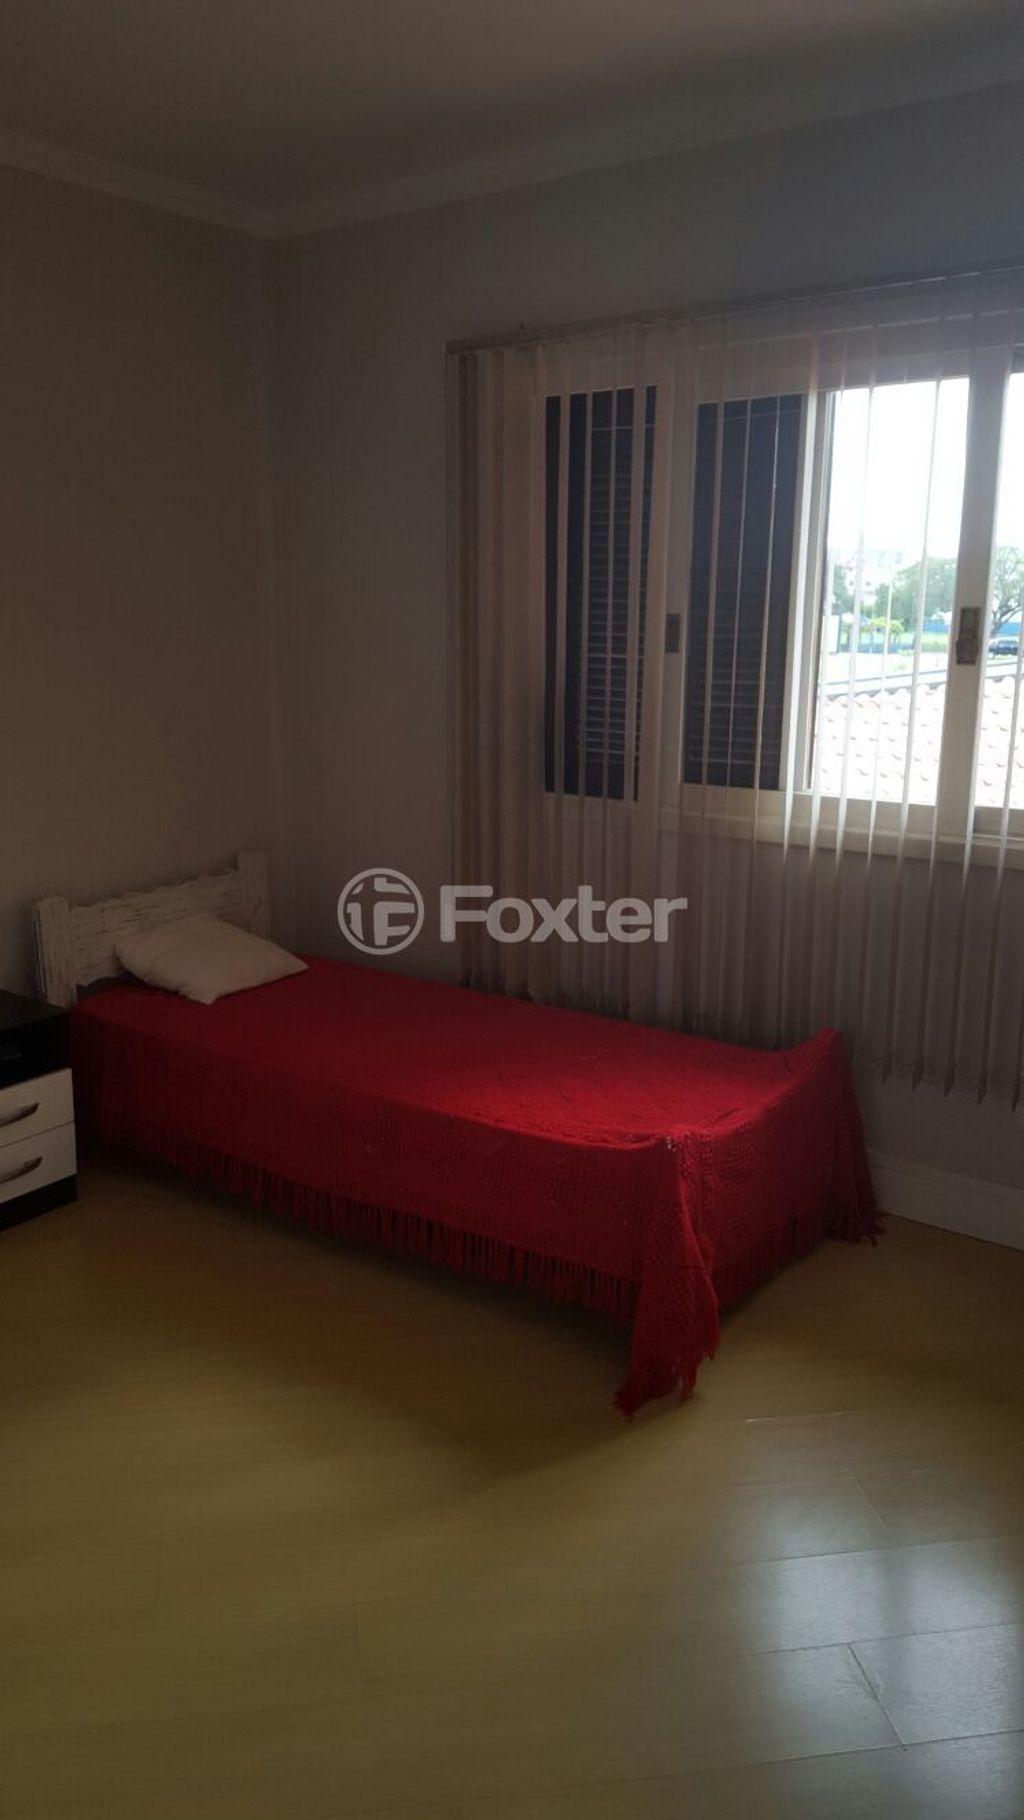 Casa 4 Dorm, Sarandi, Porto Alegre (136329) - Foto 12